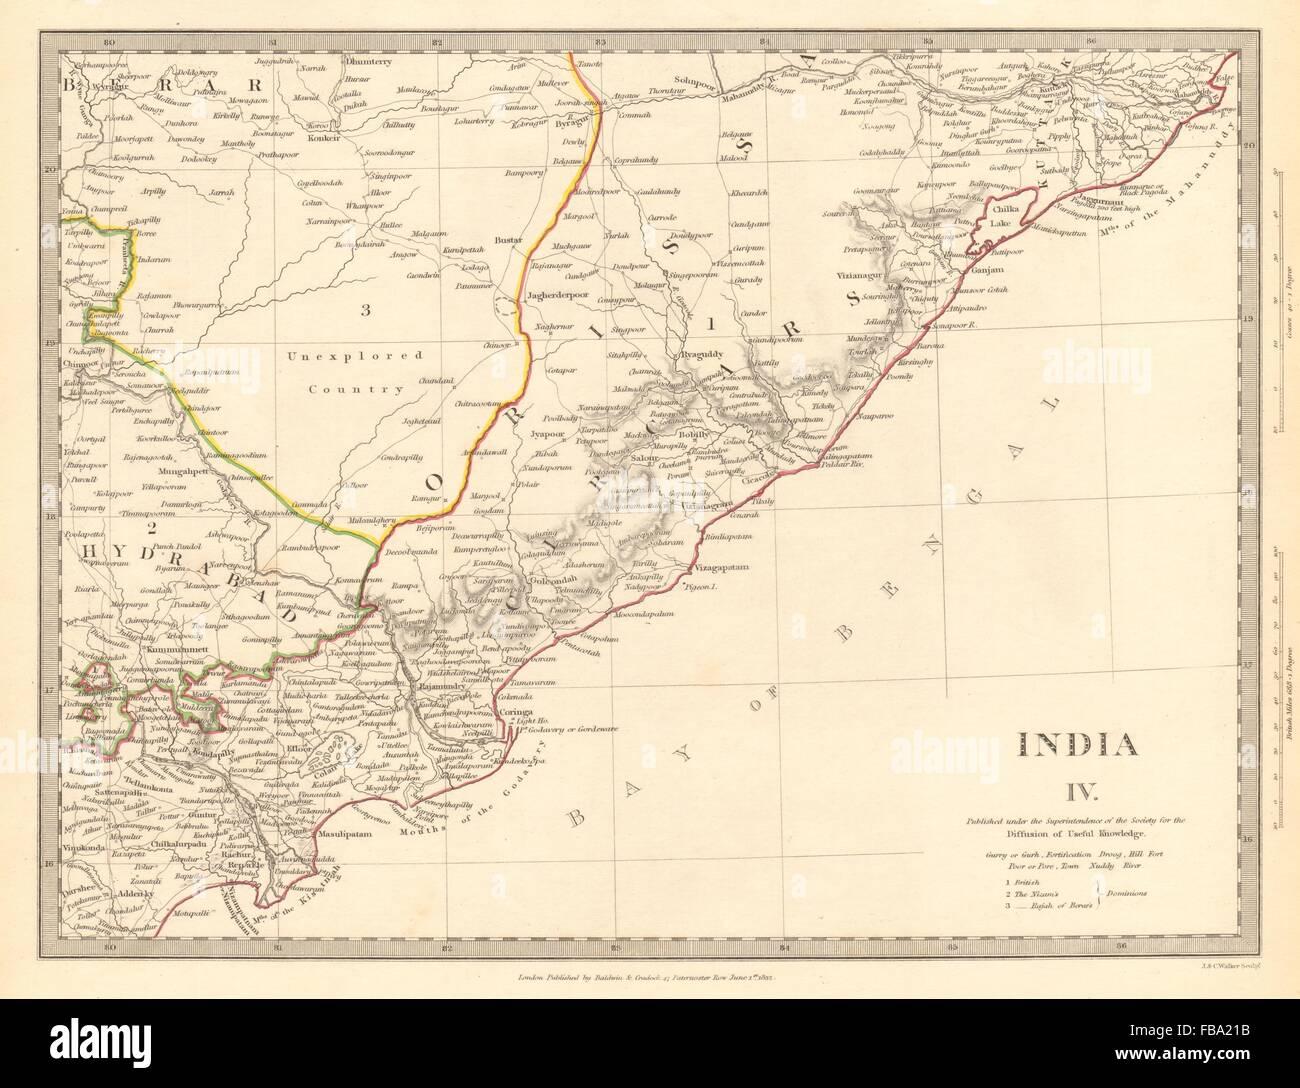 Hyderabad India Map Stock Photos & Hyderabad India Map Stock Images on madras india map, andhra pradesh map, bengalor india map, new delhi, jaipur india map, dhaka india map, kabul india map, nagpur india map, madurai india map, karimnagar india map, andhra pradesh, taj mahal india map, lucknow india map, godavari river map, ahmedabad india map, kanpur india map, tamil nadu, surat india map, kolkata india map, varanasi india map, agra india map, bangalore india map, pune india map,